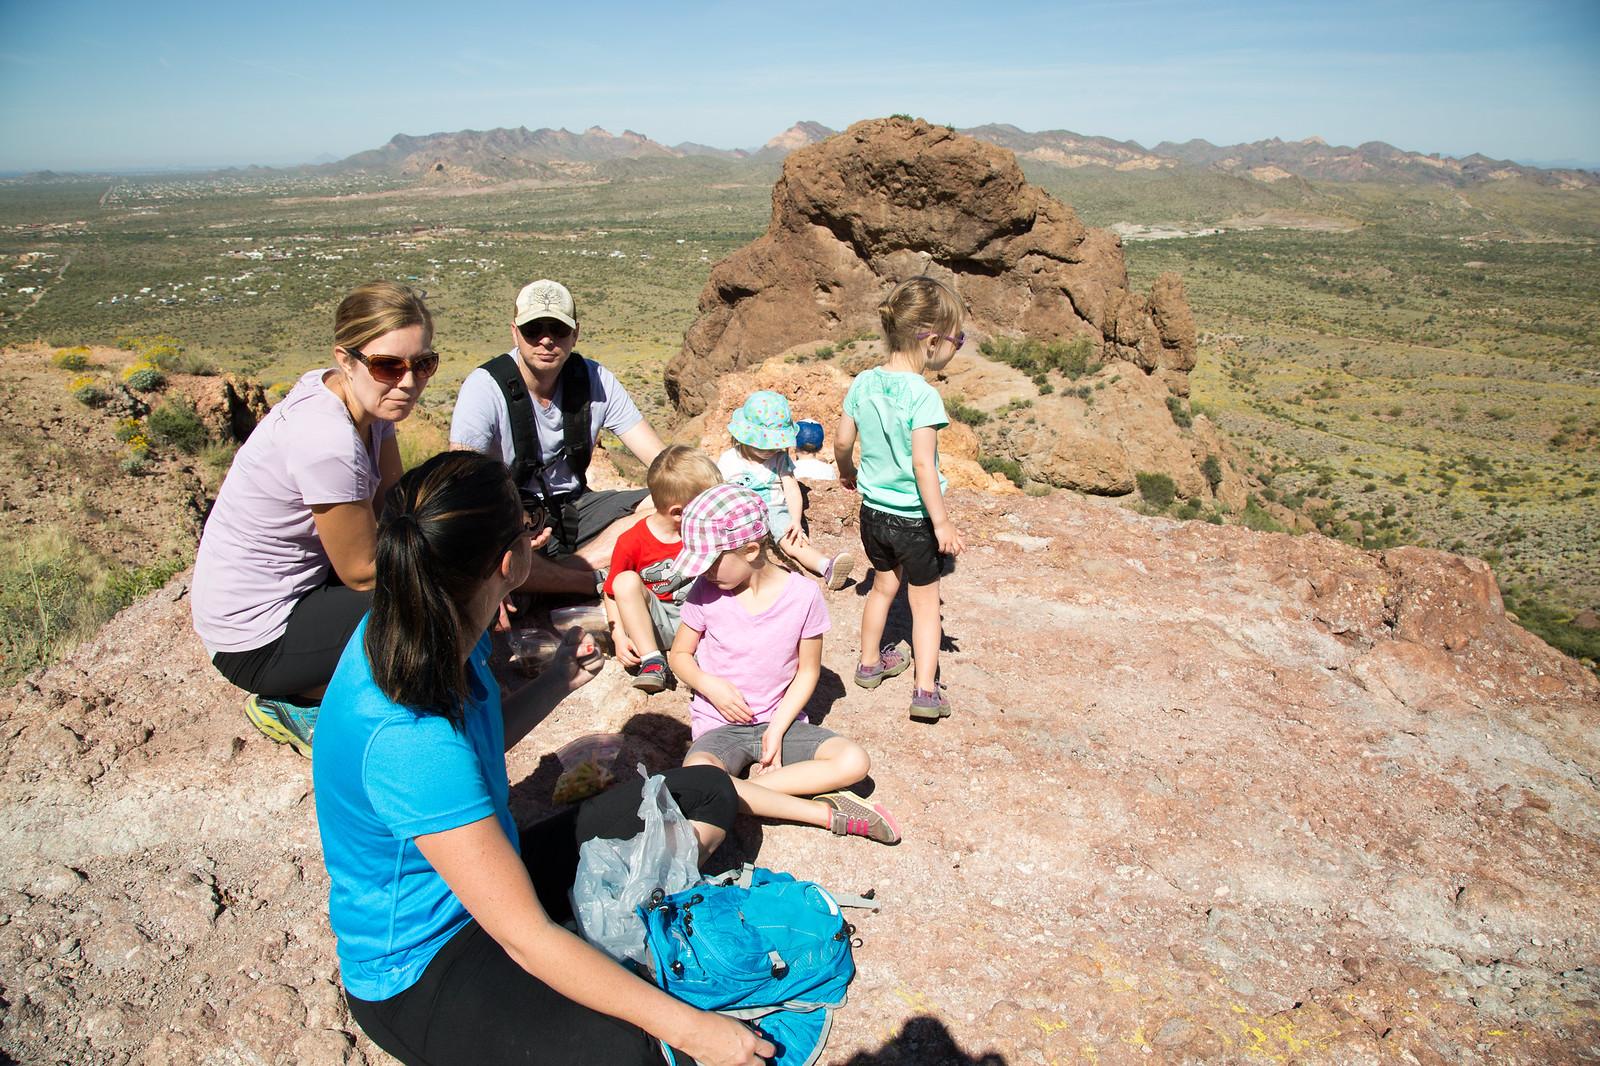 2015-03-12 Arizona-6436.jpg